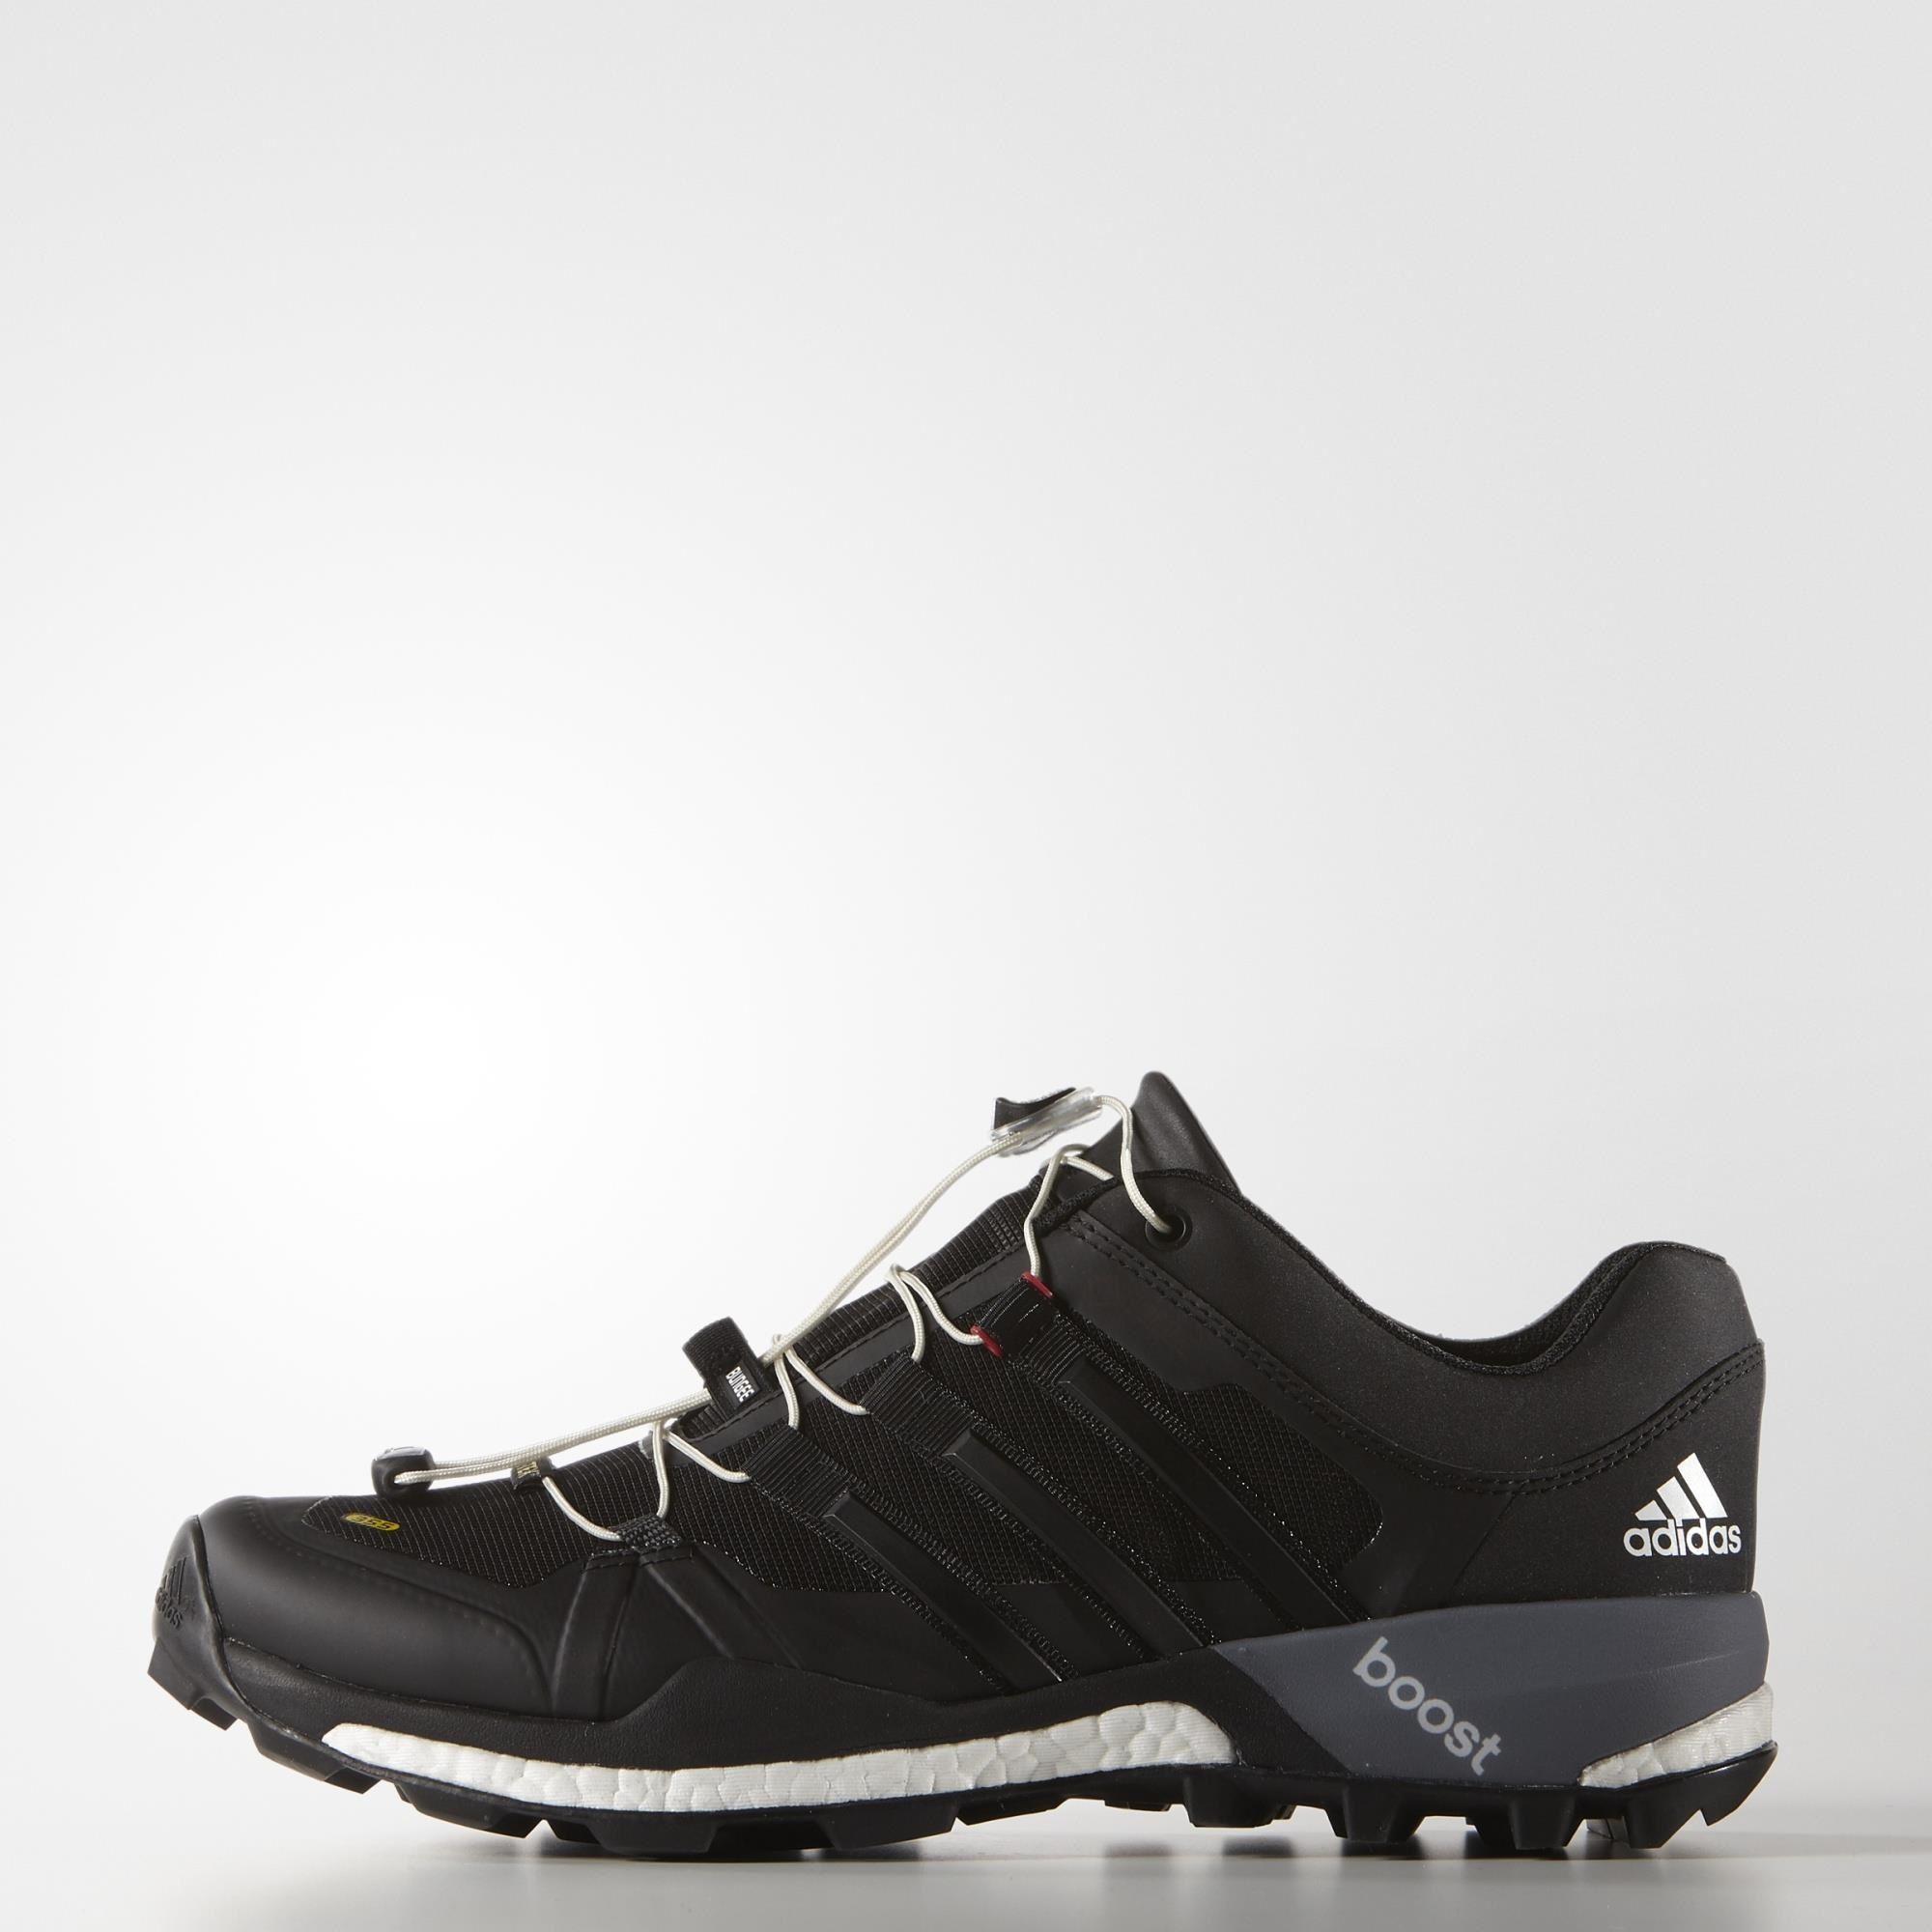 adidas impulso terrex gtx formatori pinterest impulso e scarpe adidas